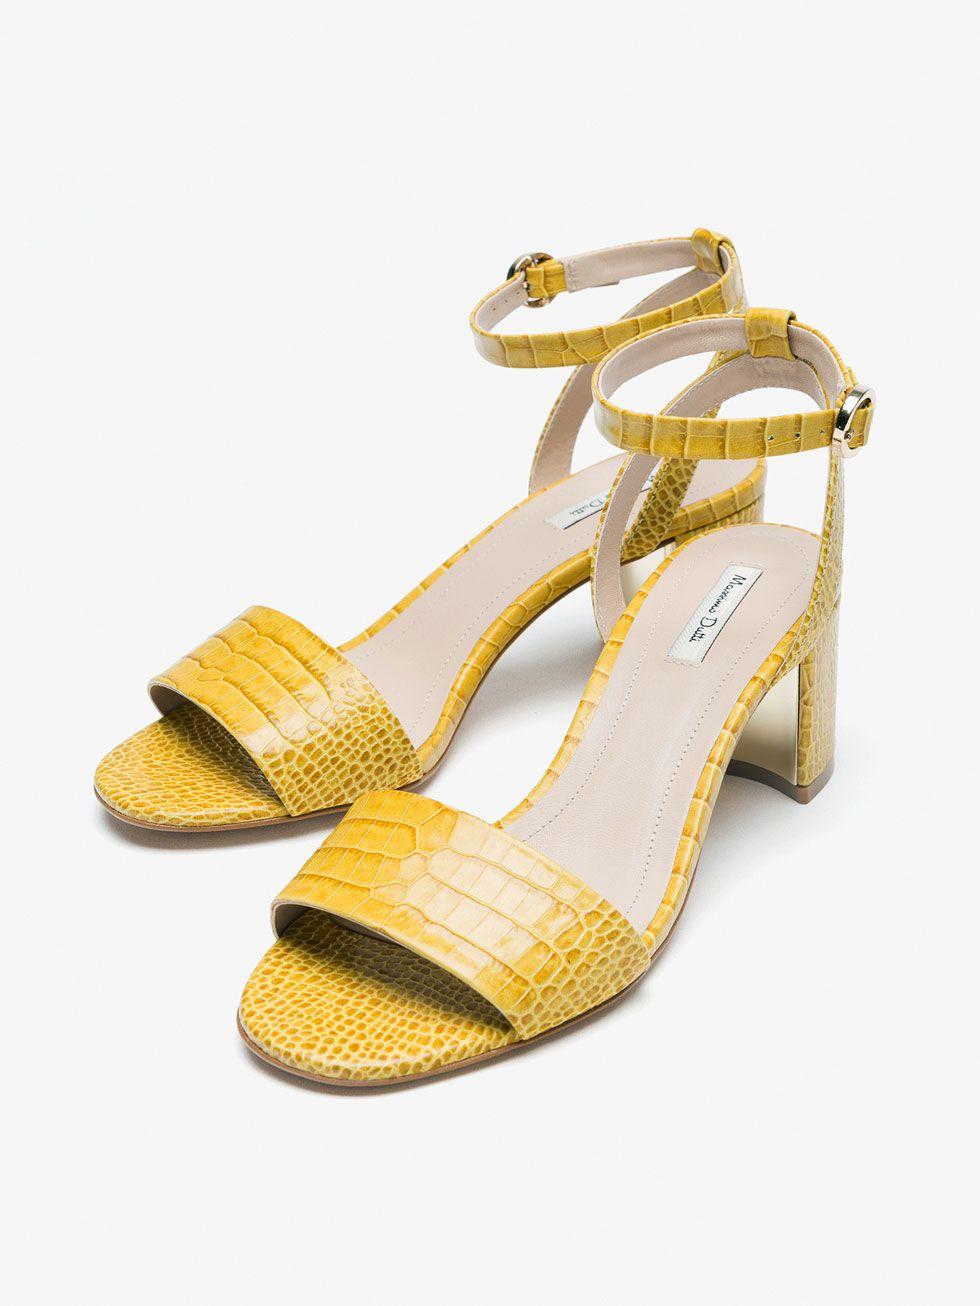 Amarillo Todo Ver Massimo Sandalia Piel Mujer Coco De Zapatos 34RAjL5